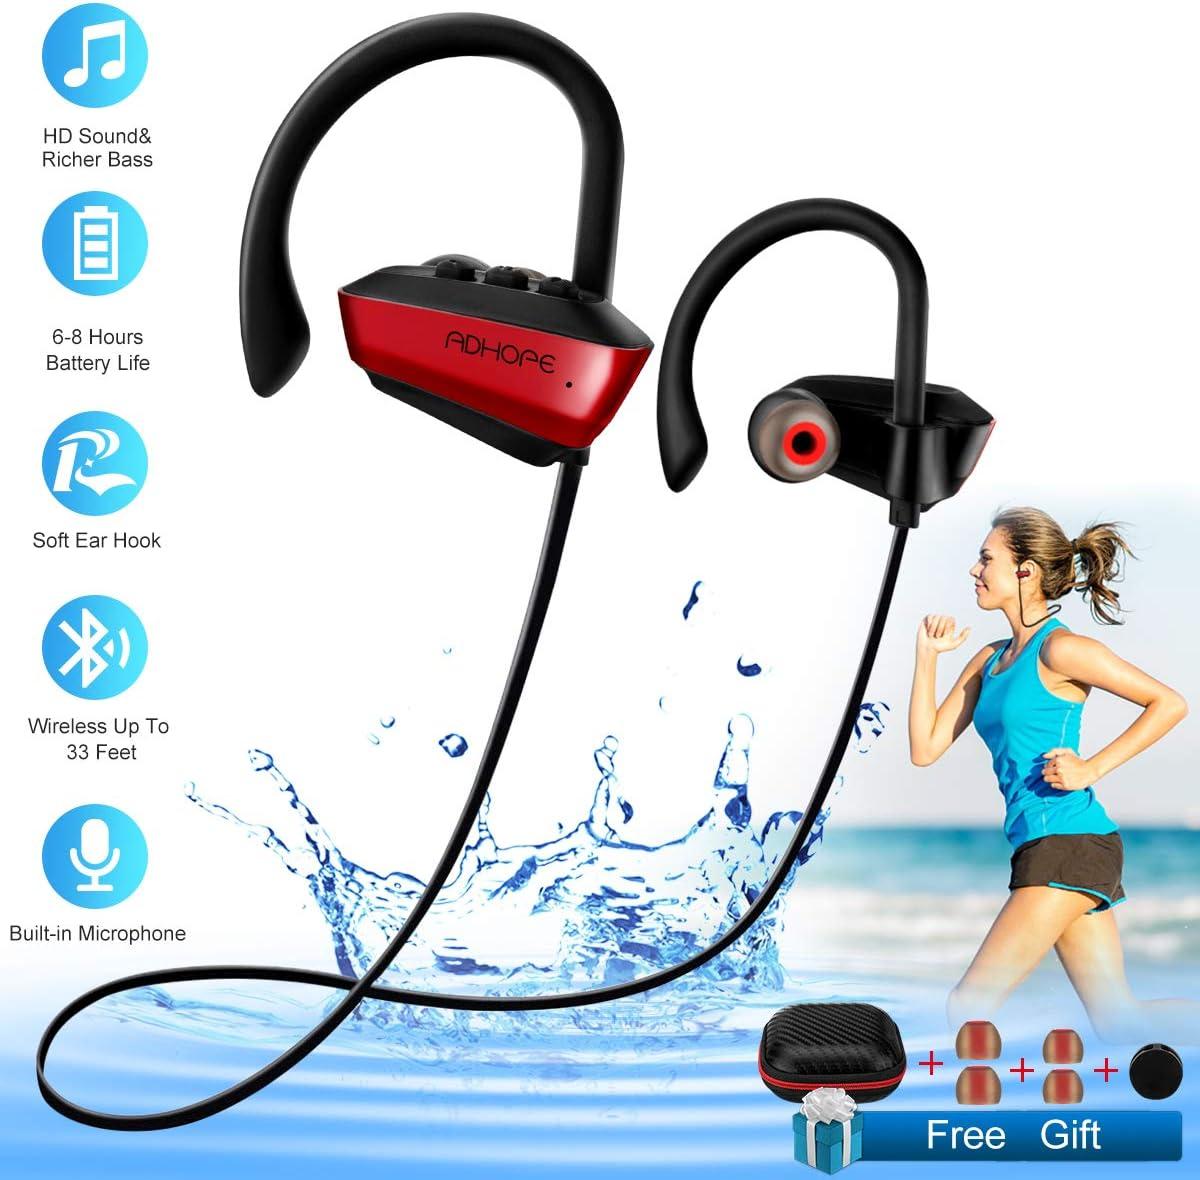 Wireless Earphones Sport Waterproof Bluetooth Headphones with Mic for Running In-Ear Wireless Sport Earbuds 8 Hour Playtime Bass Stereo Sweatproof Headphones for Workout Gym Men Women